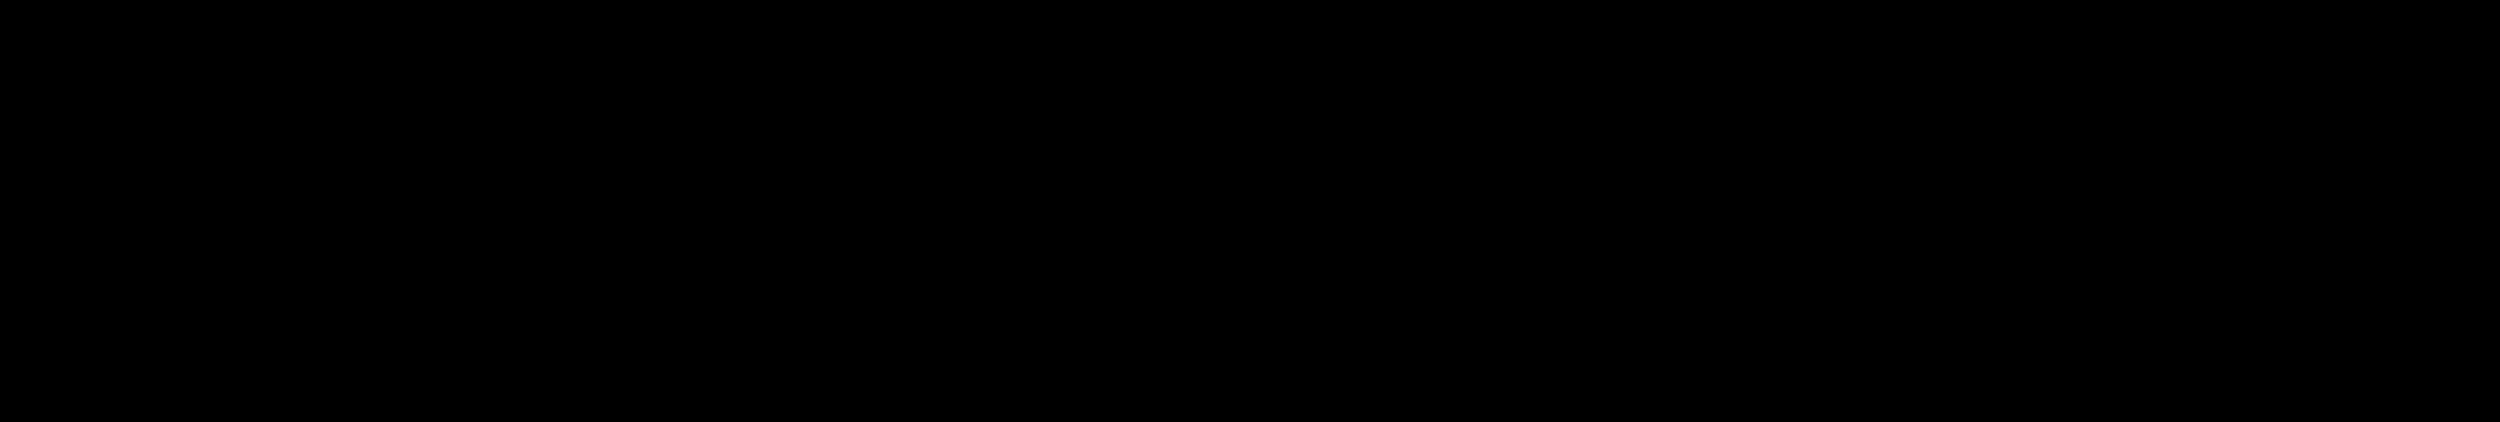 real-life-yoga-flughafen-zurich-zrh-logo-business.png